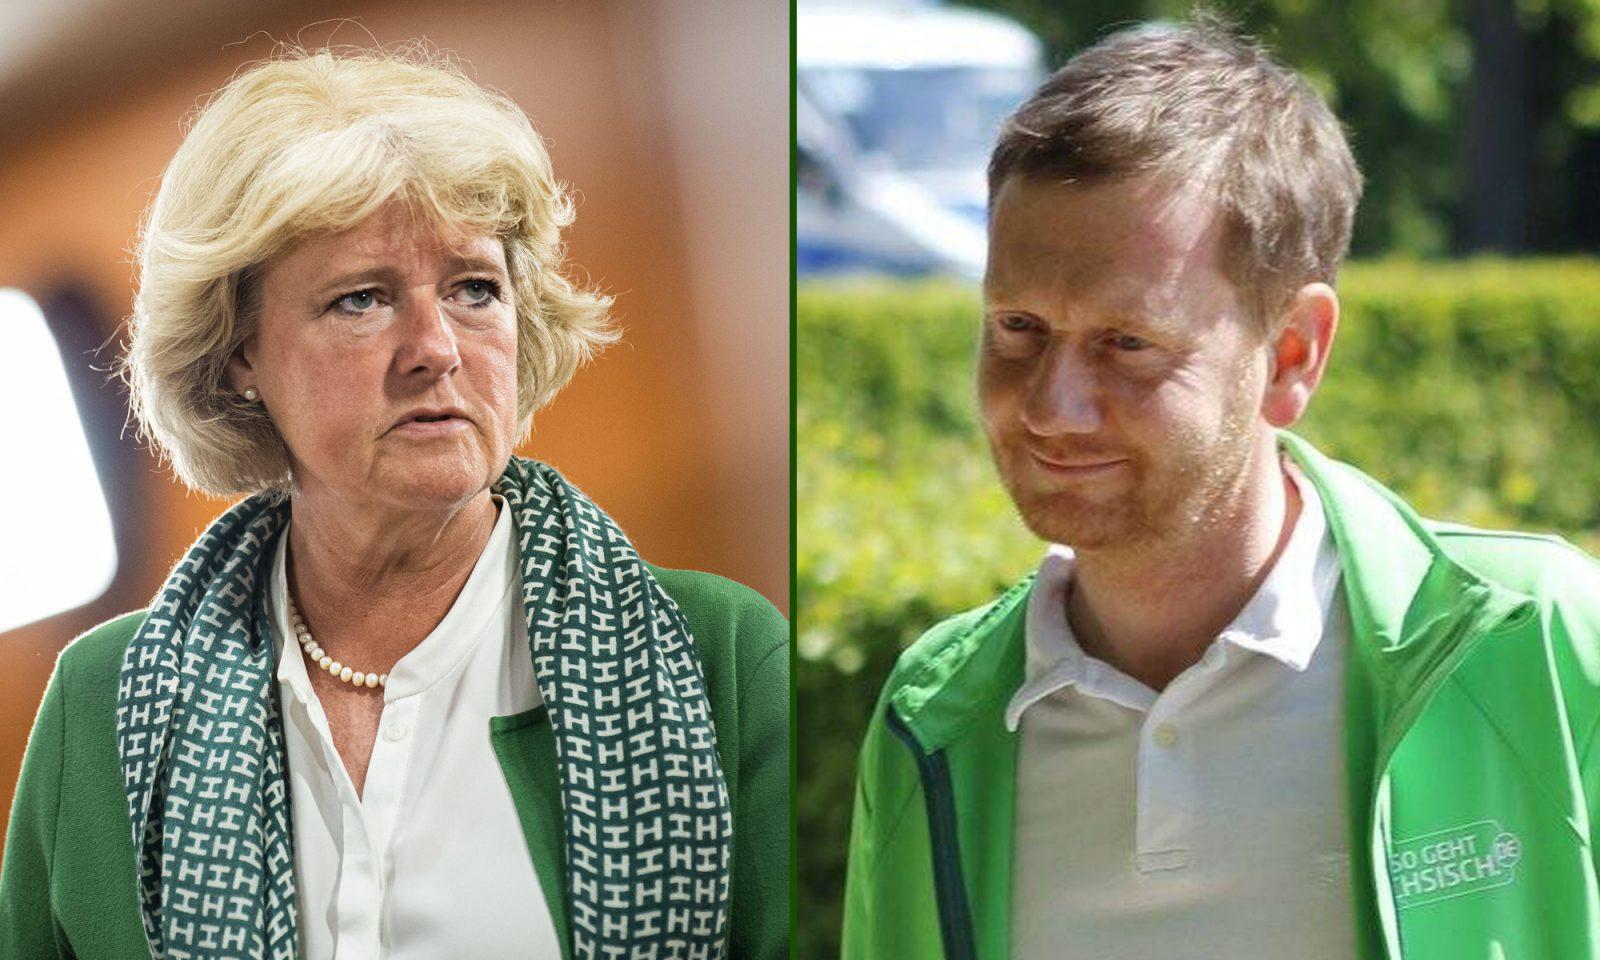 Monika Grütters und Michael Kretschmer (beide CDU)